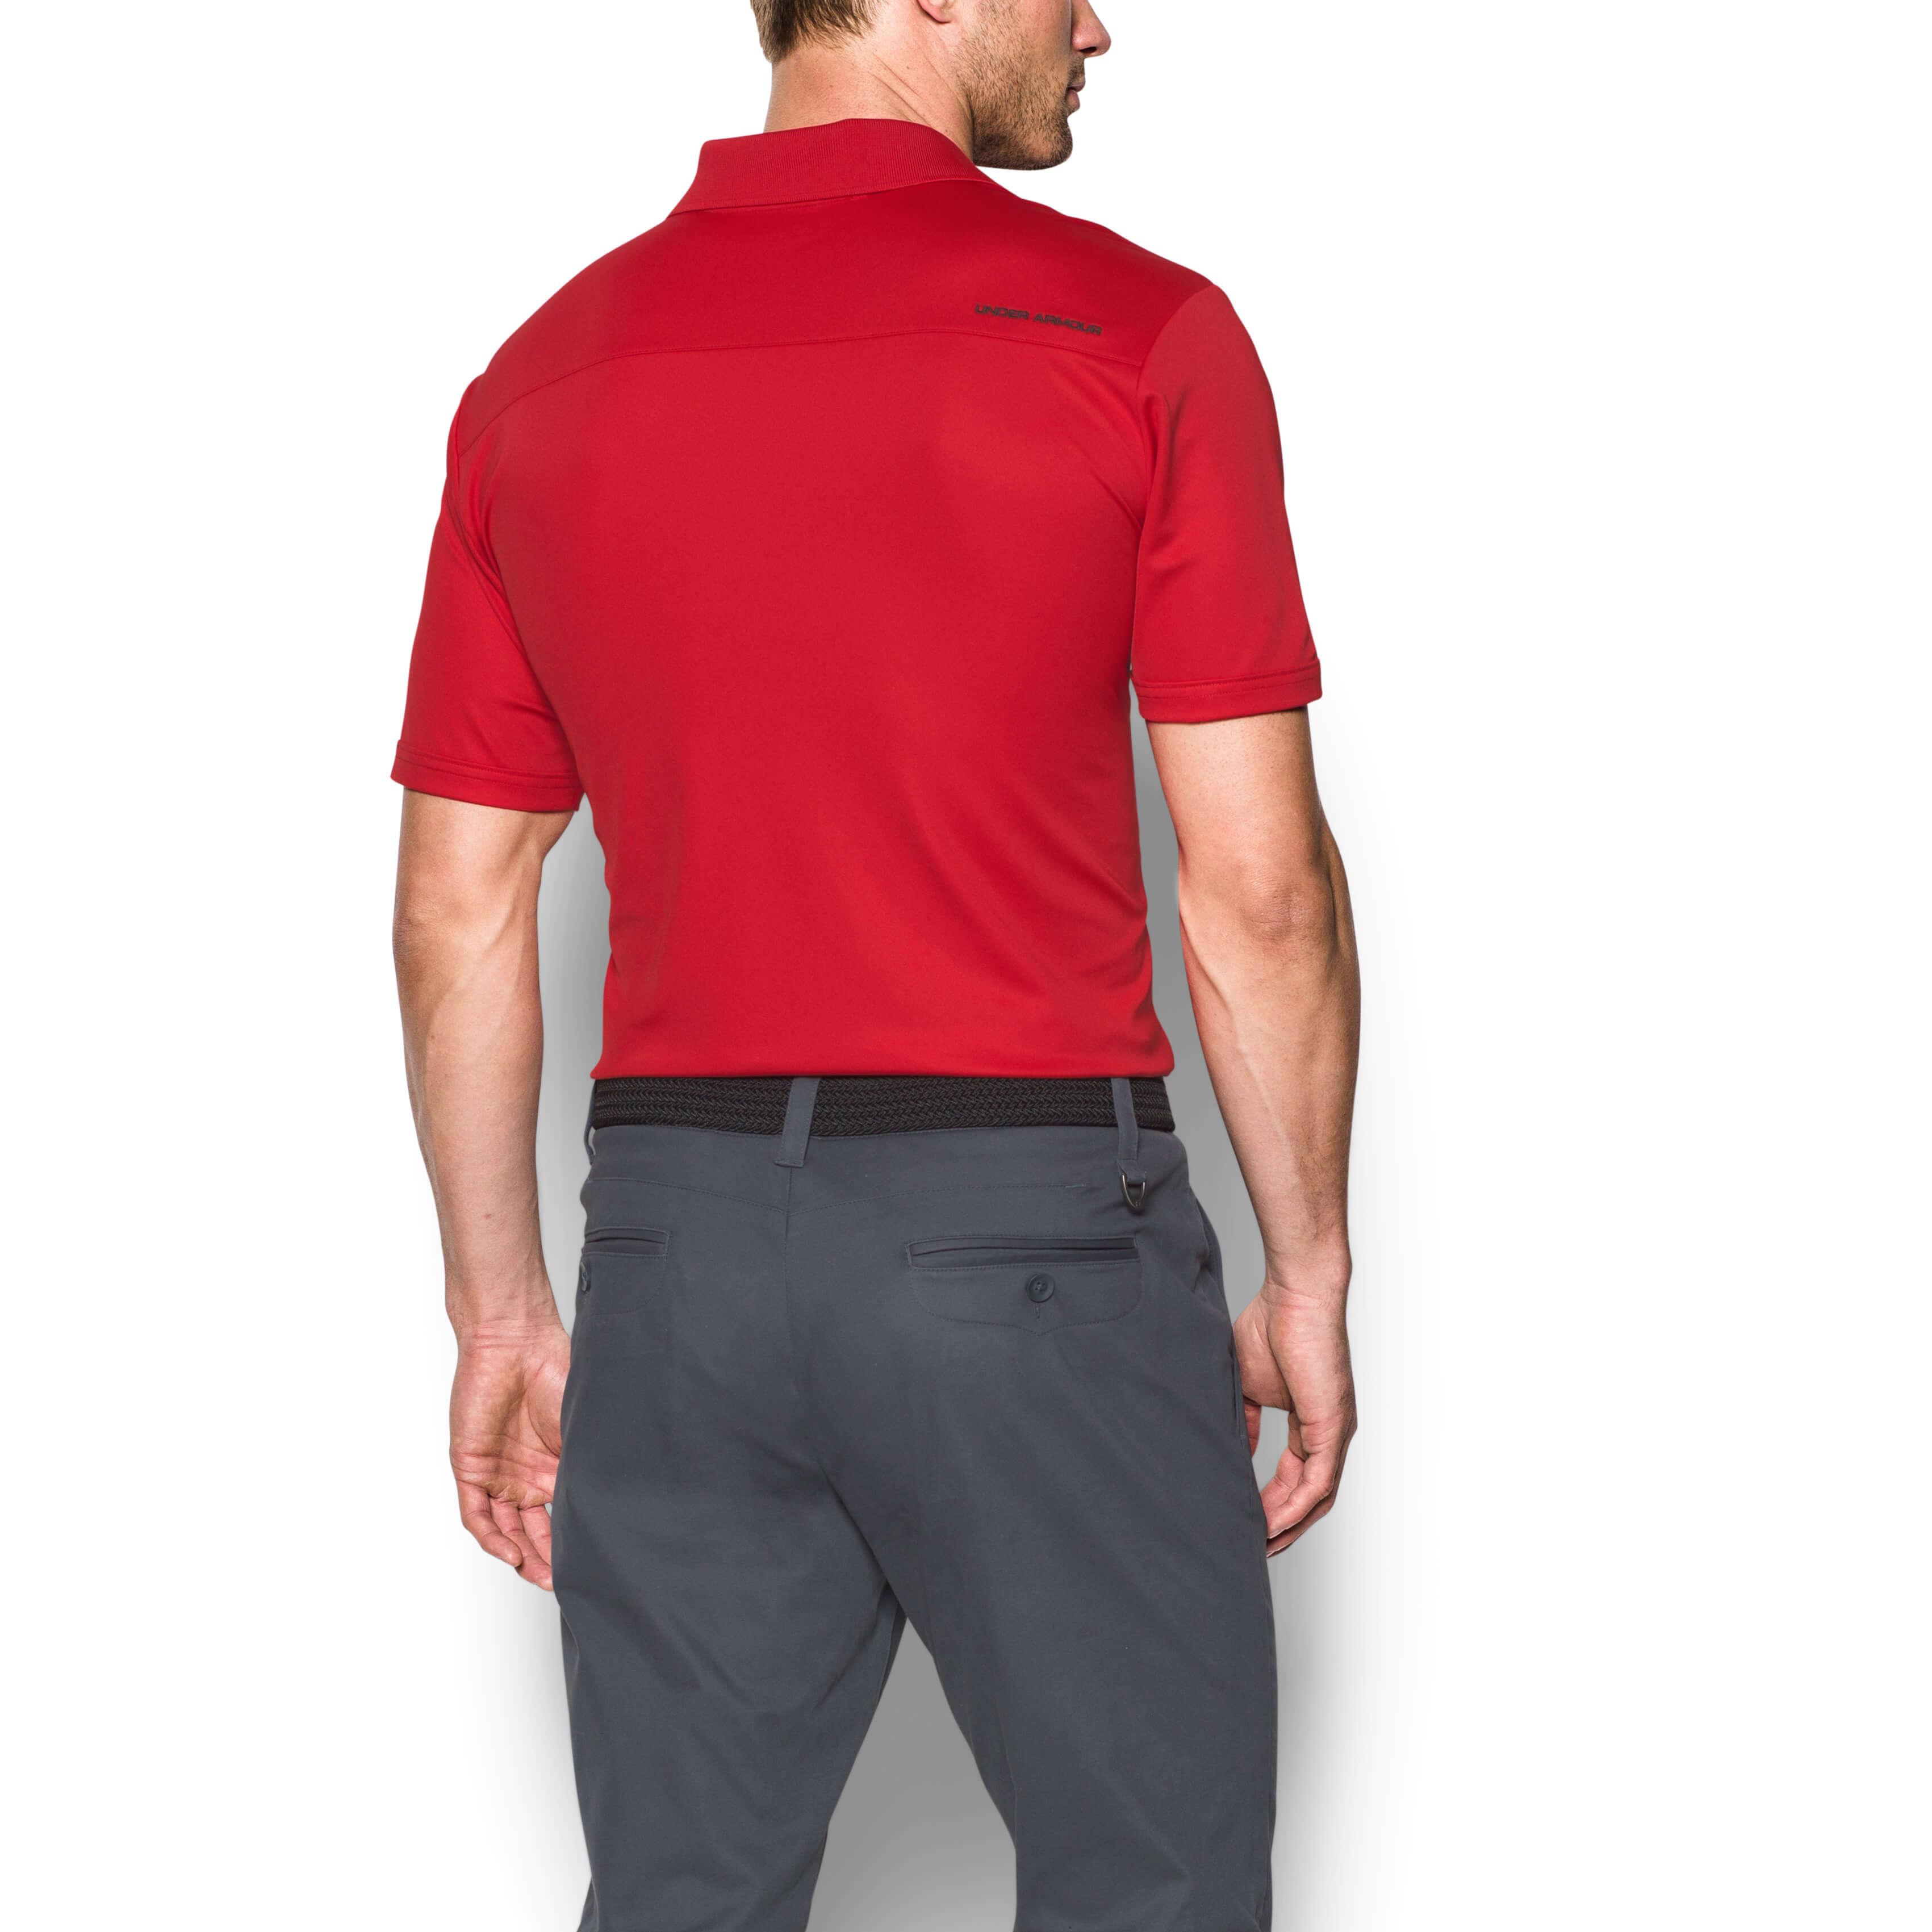 Under-Armour-Mens-Medal-Play-Performance-Polo-Shirt-UA-Golf-Short-Sleeve thumbnail 22